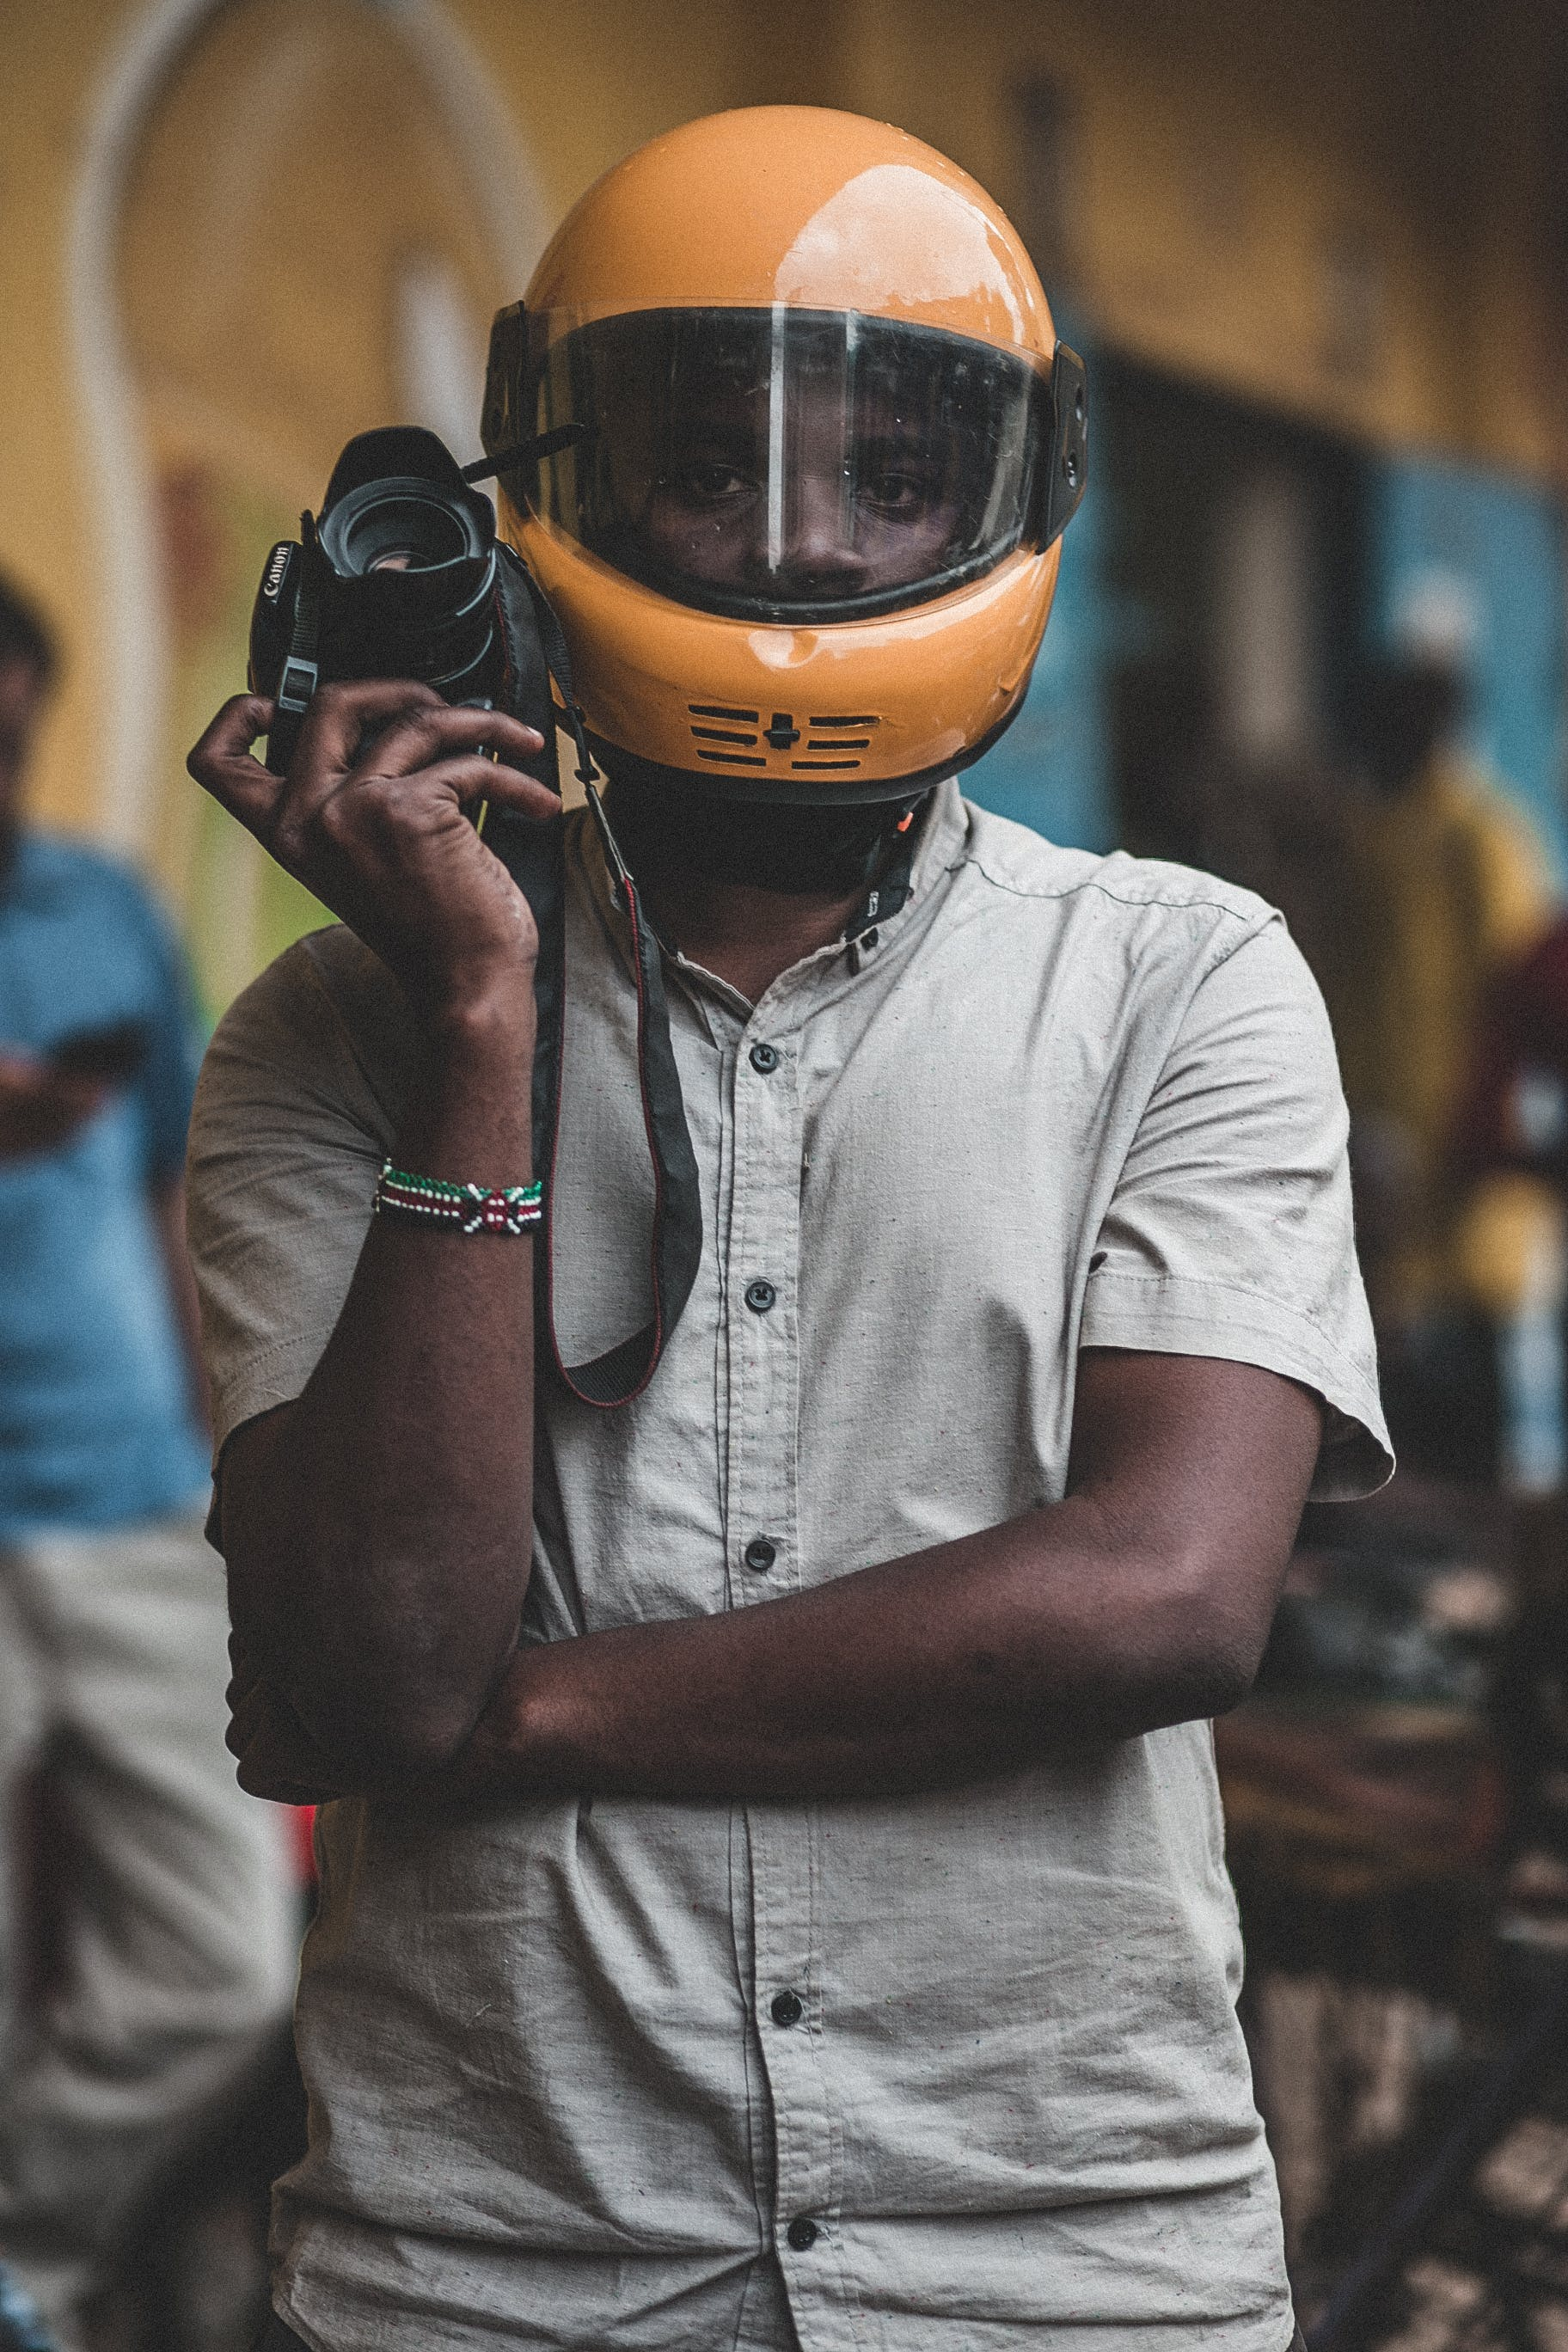 Man Wearing Yellow Helmet